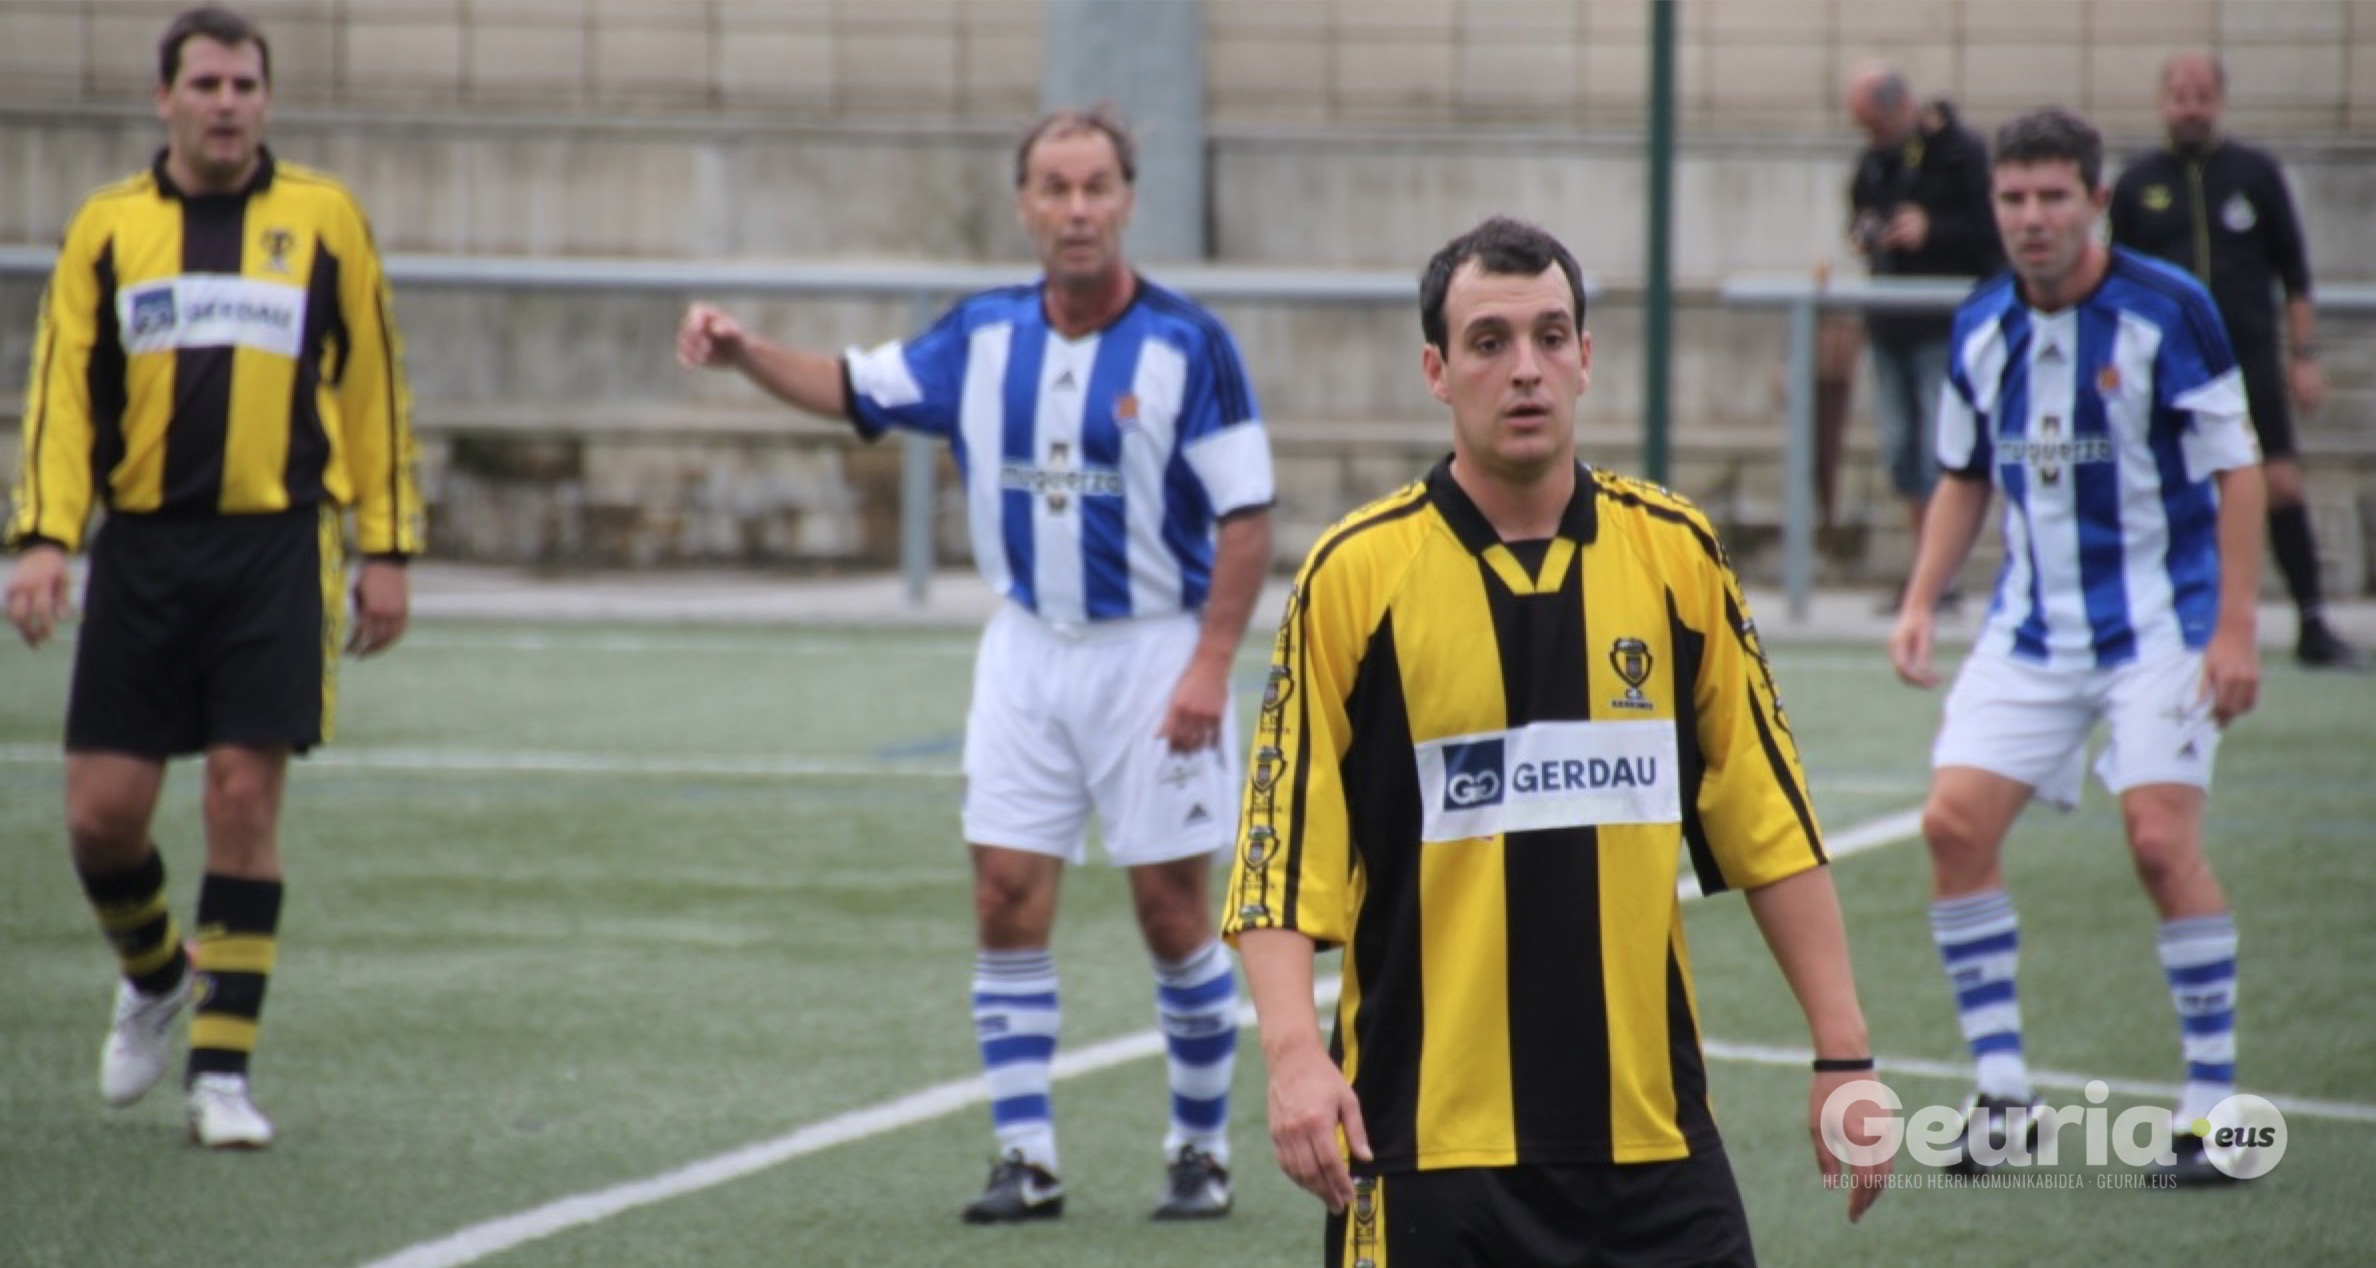 basauri_san_fausto_2015_futbol_basconia_beteranoak_13